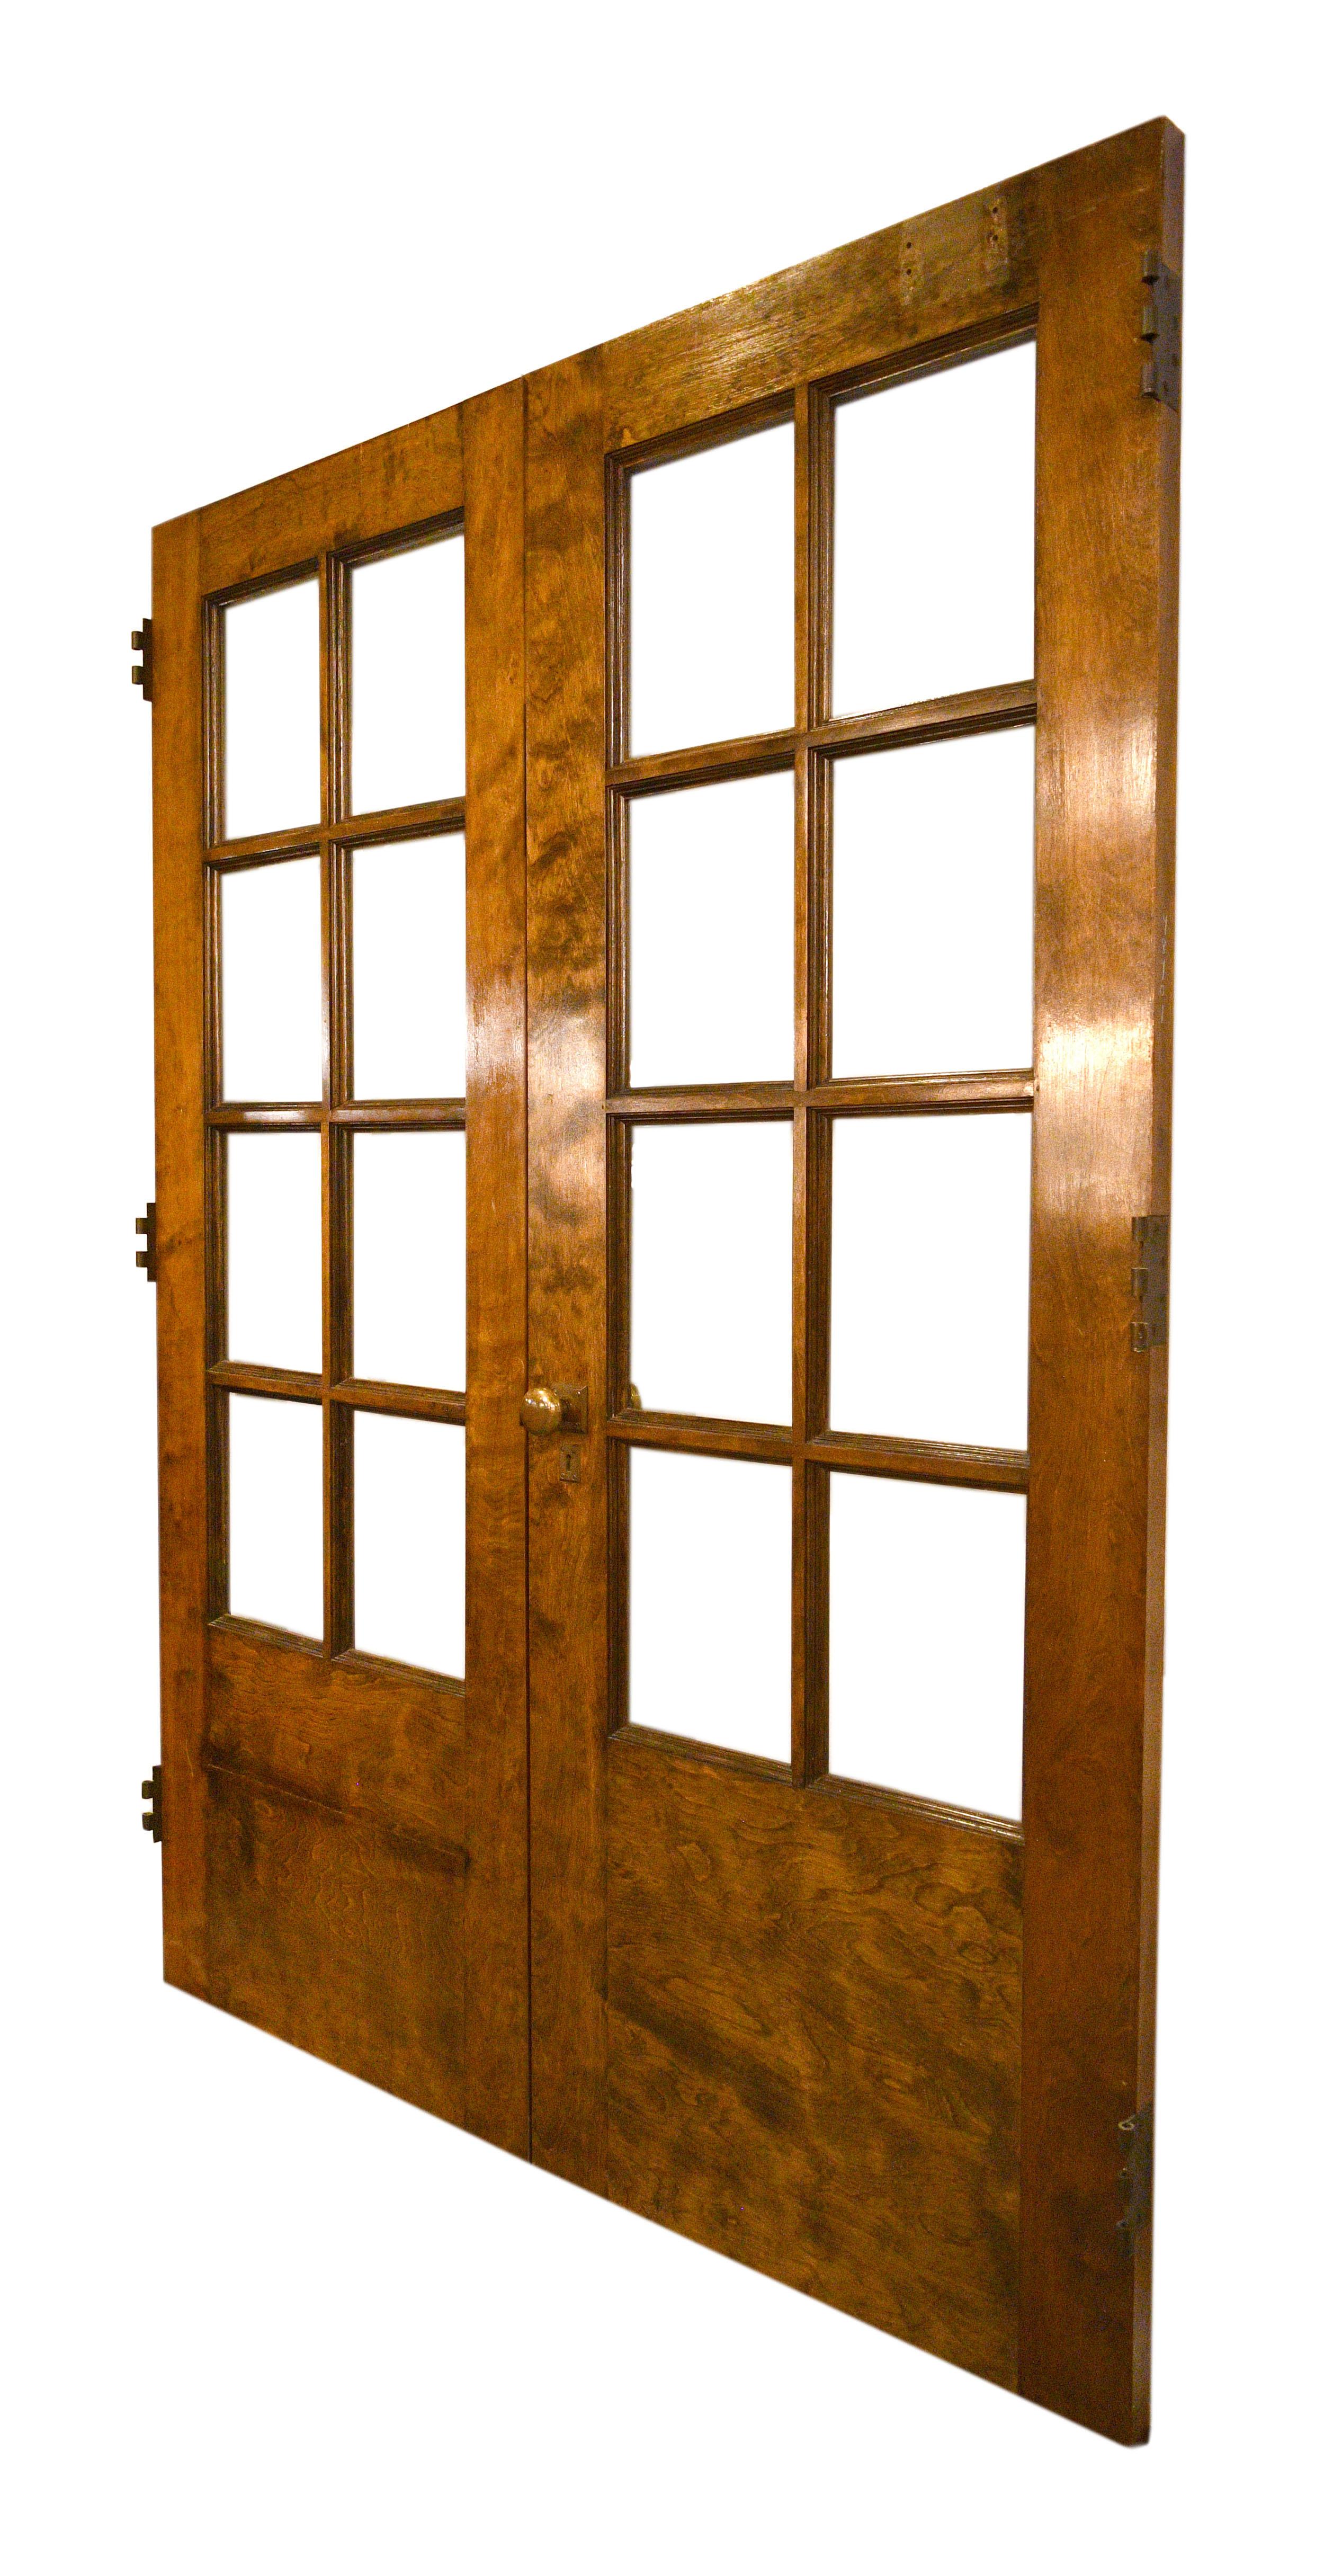 48404-double-door-clear-8-lite-knob-angled-sideedit2.jpg